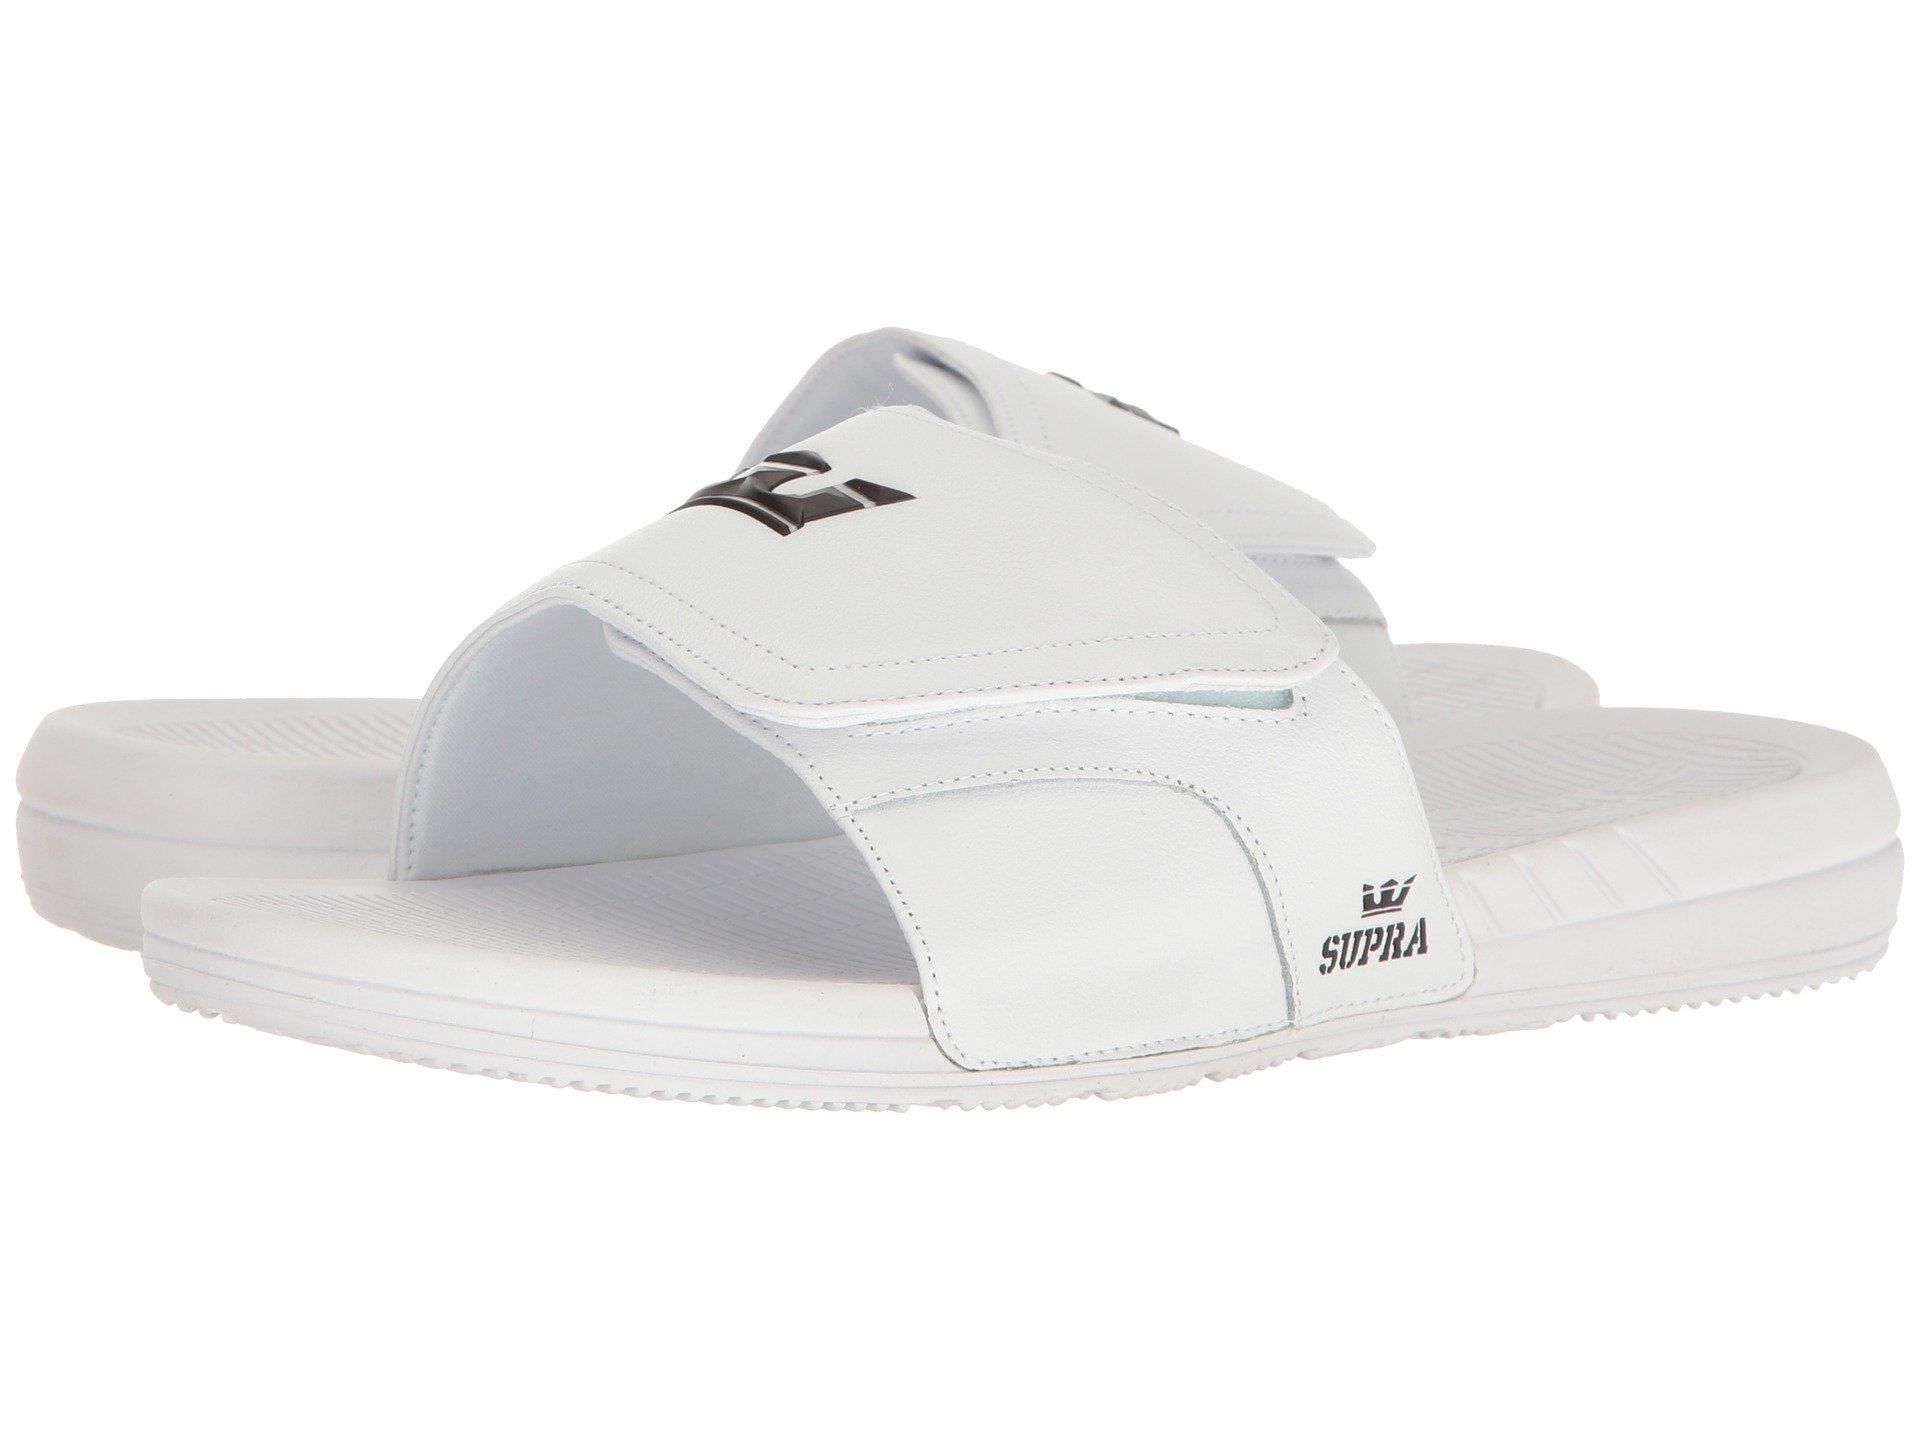 0191dfc3c779 Supra Locker In White White